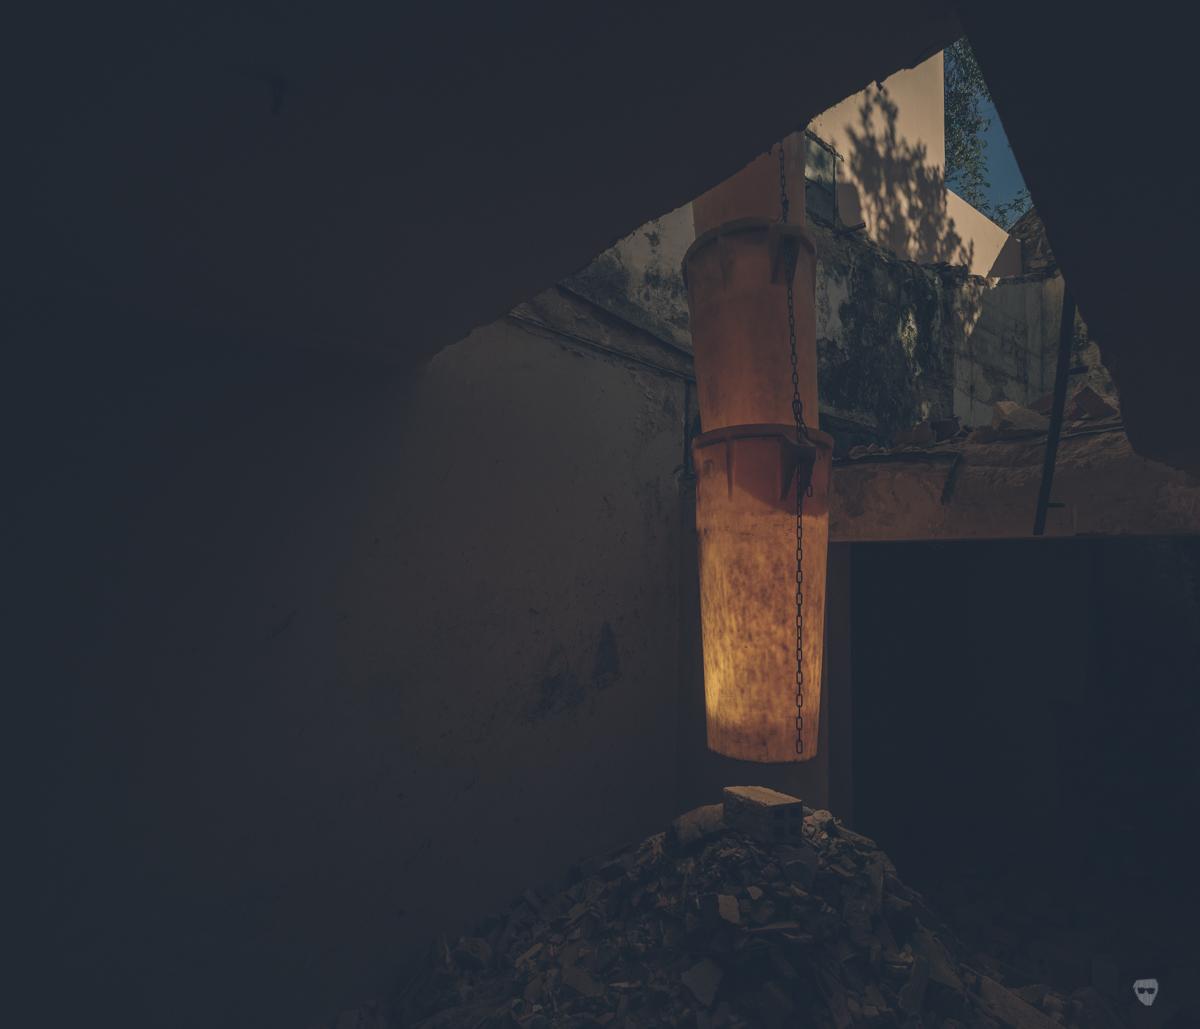 demolicao-12.jpg